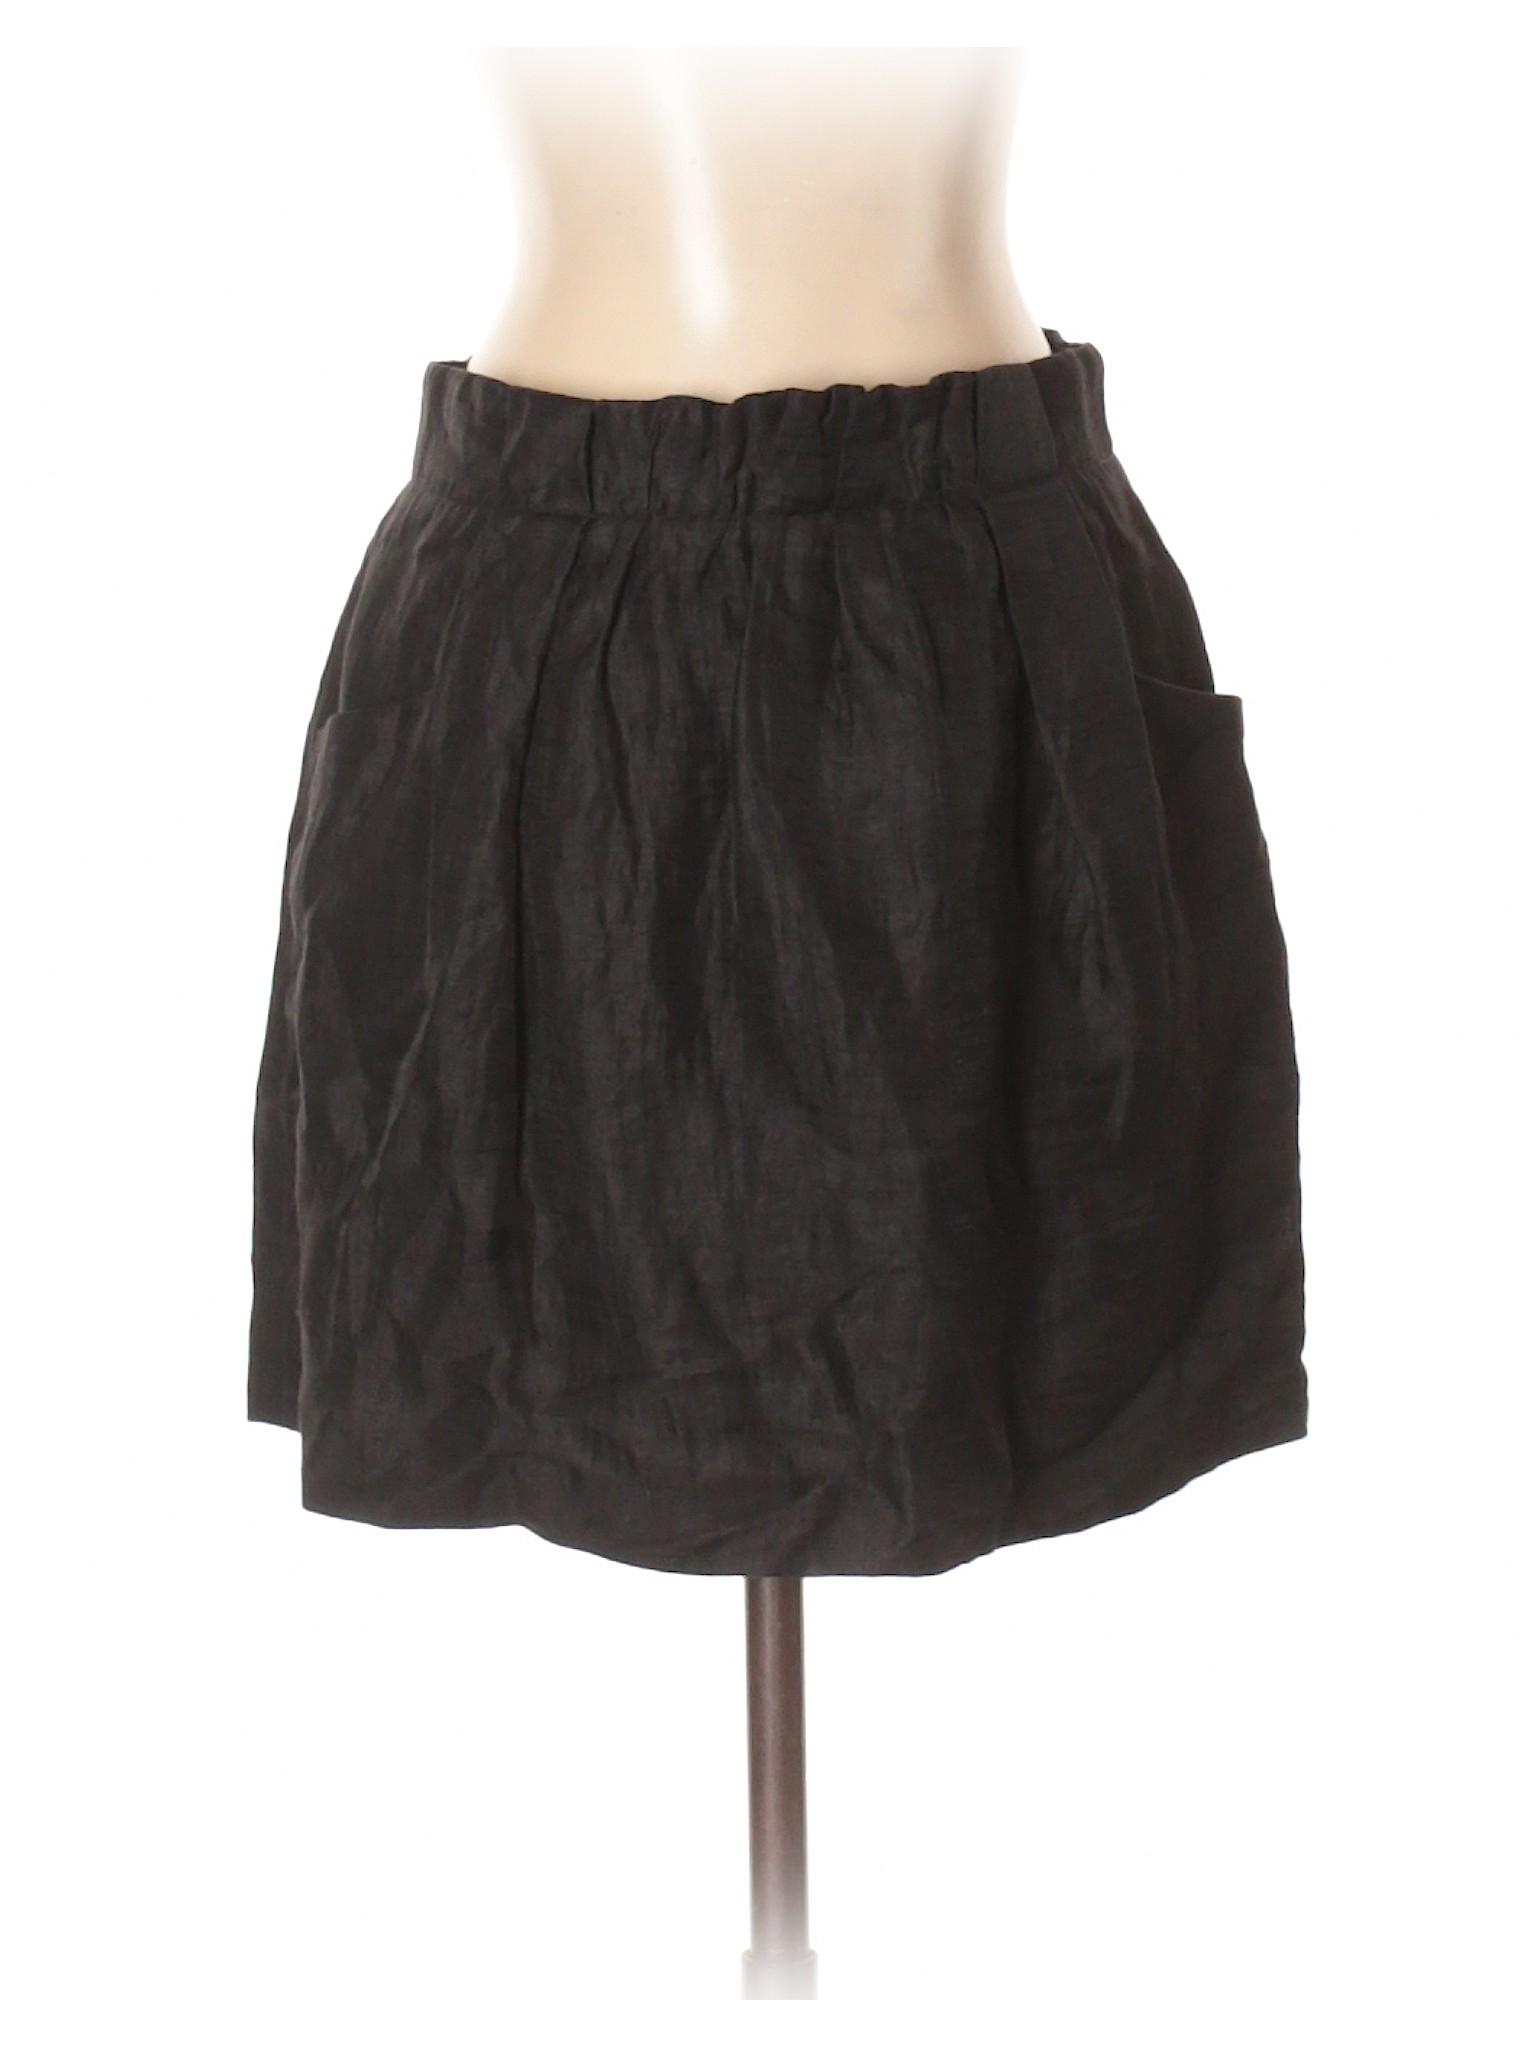 Casual Boutique Skirt Casual Crew Boutique Boutique Crew J Boutique J Casual Skirt Skirt Crew J wwOq6AZ